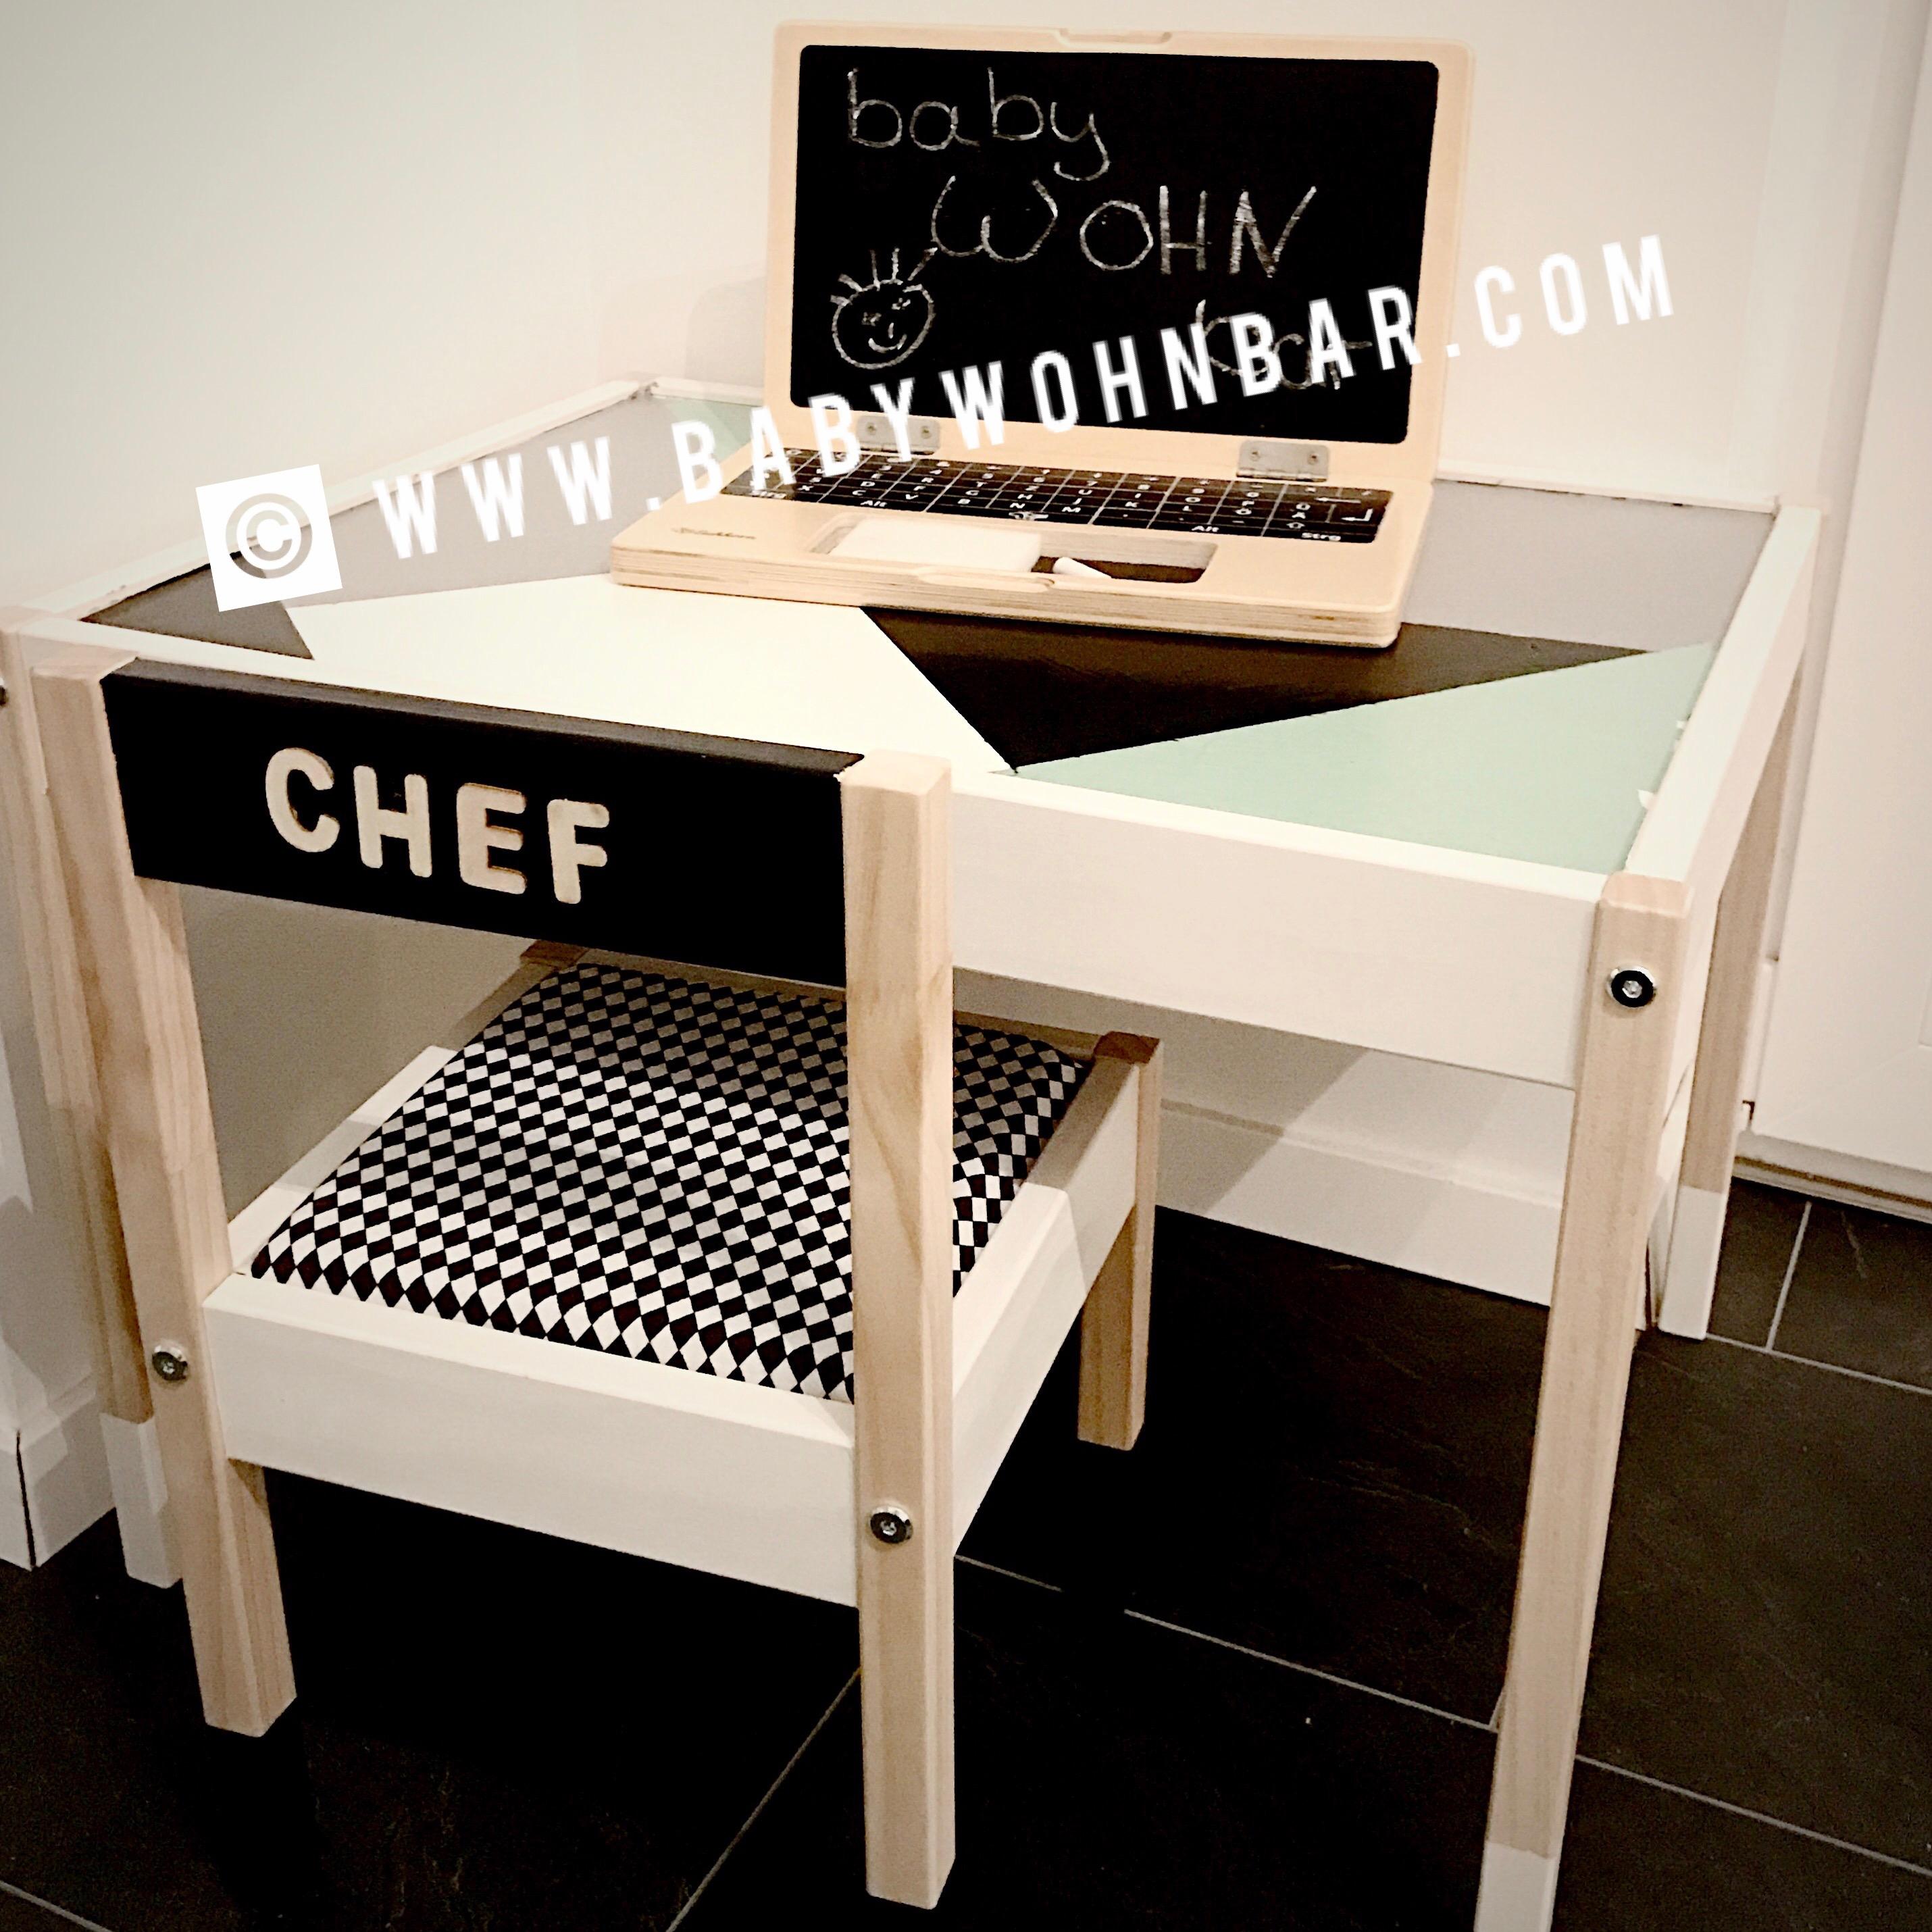 diy sitzgruppe f r kleinkinder ikea l tt babywohnbar. Black Bedroom Furniture Sets. Home Design Ideas